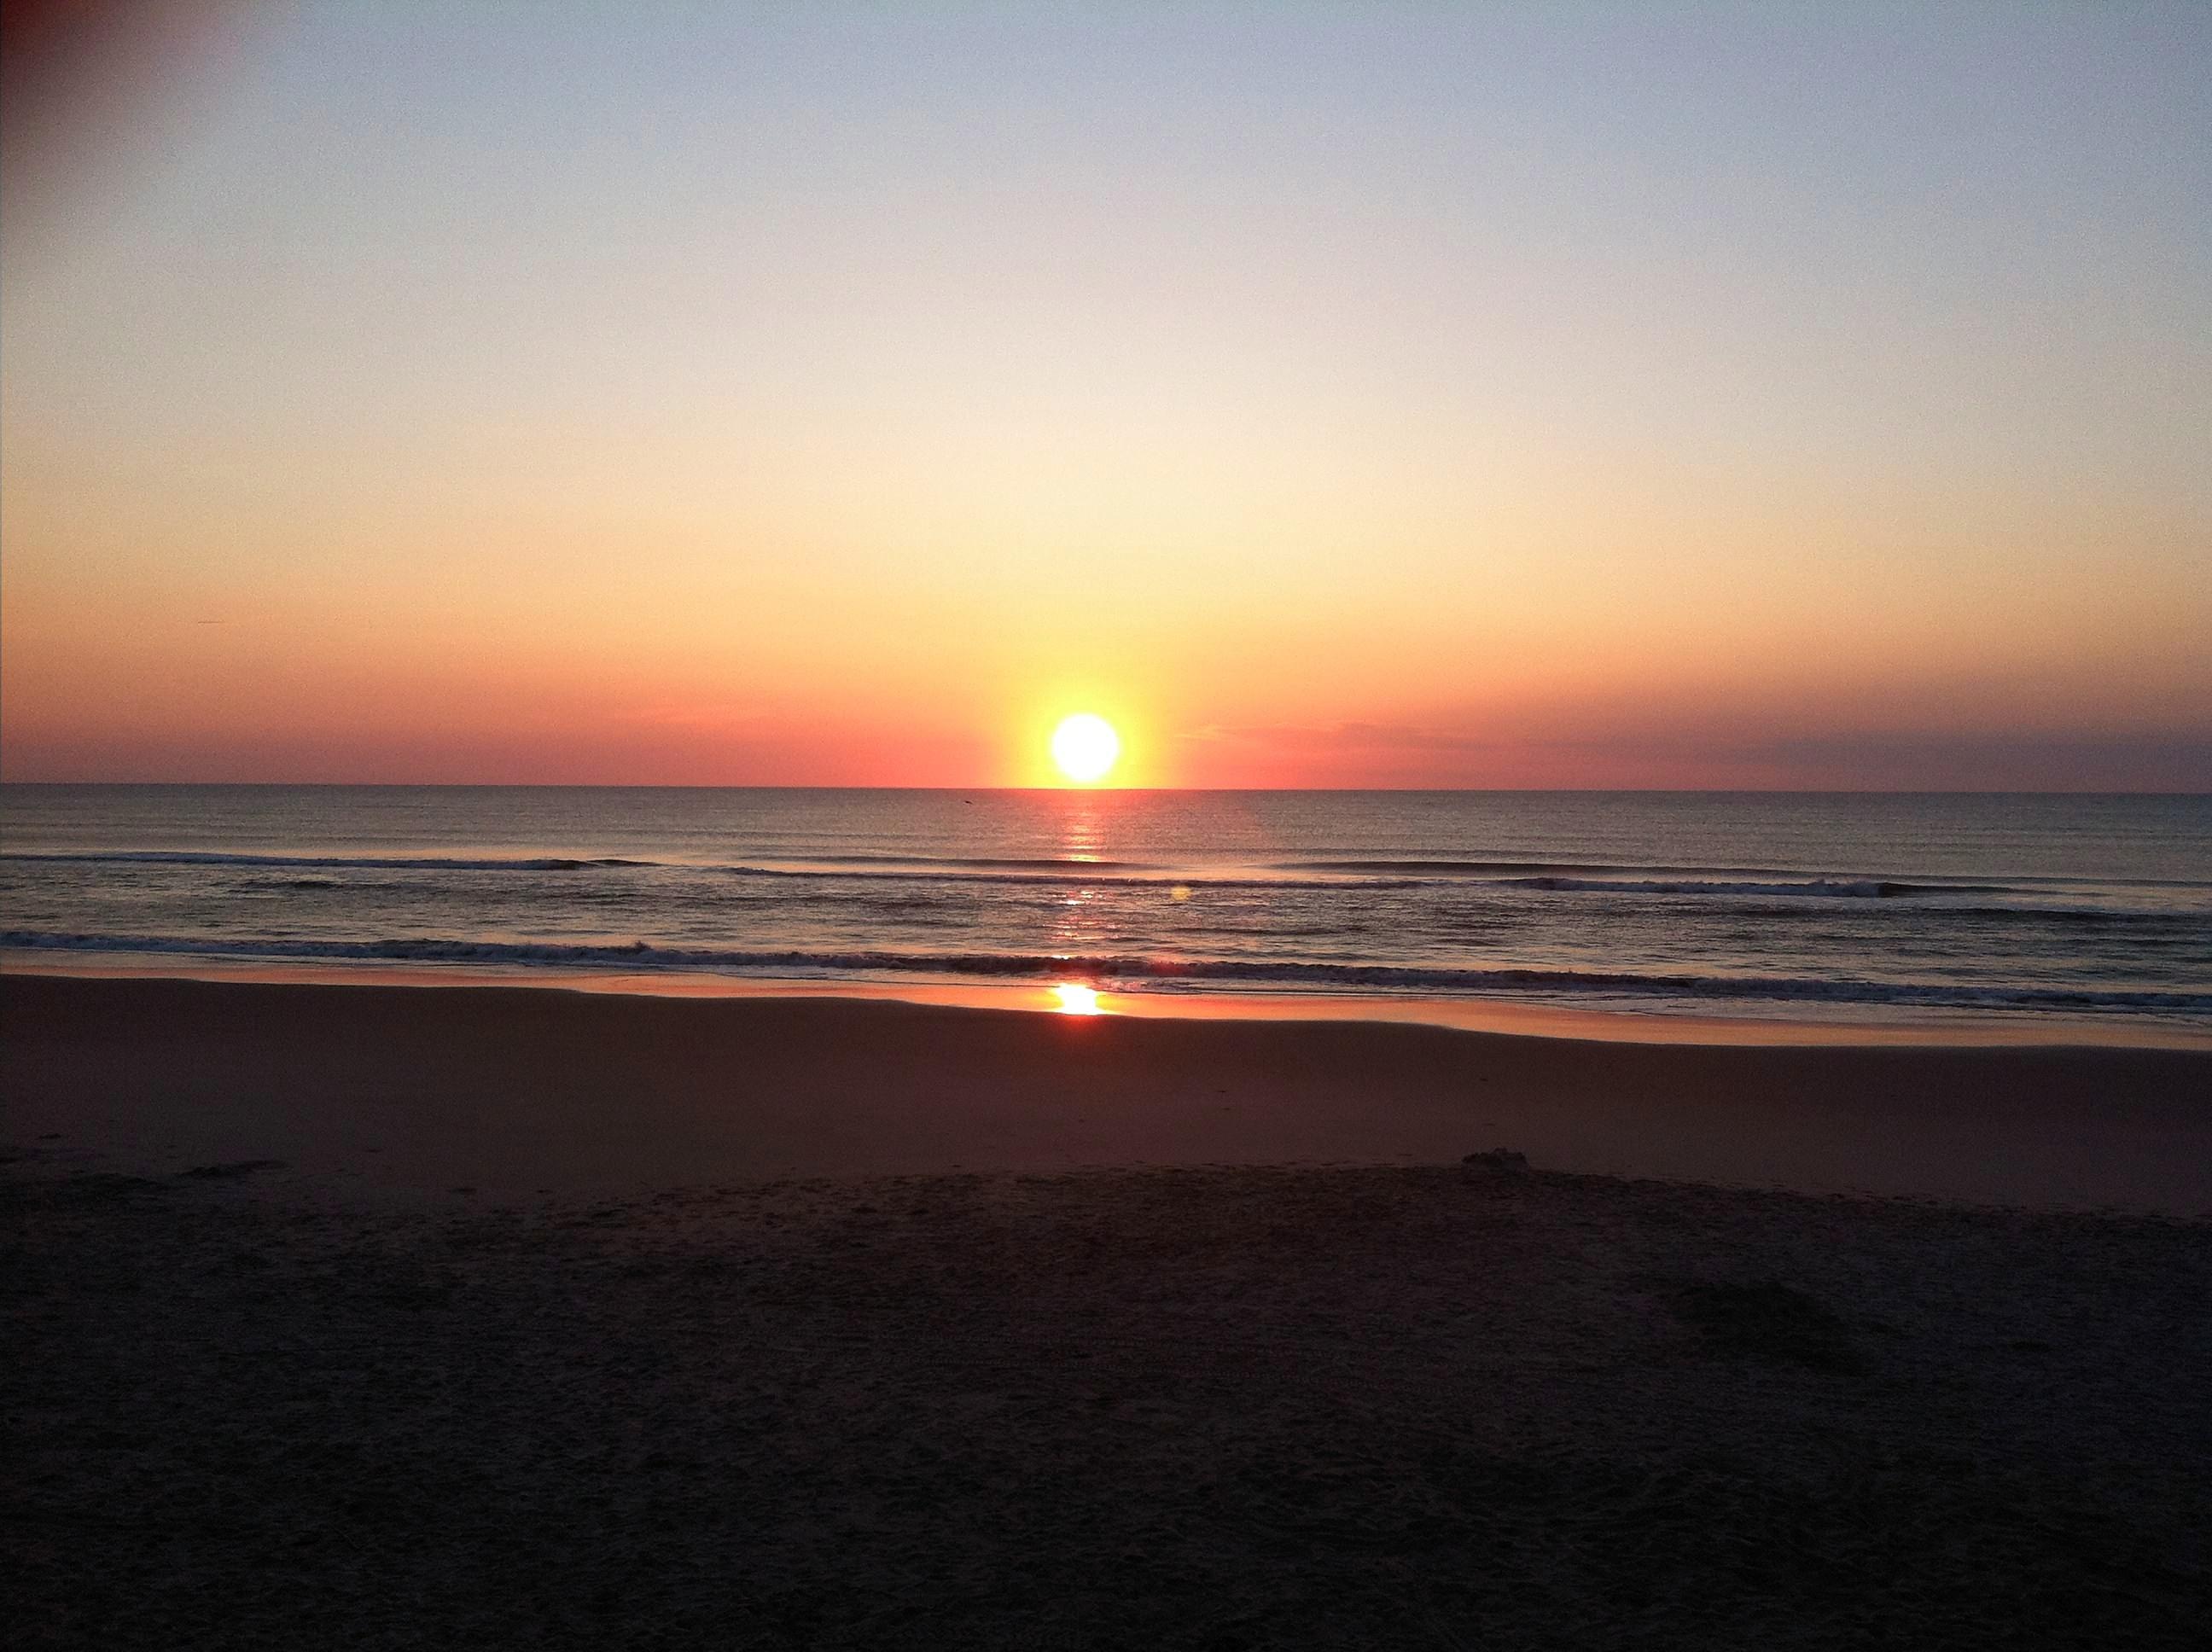 https://0201.nccdn.net/1_2/000/000/193/4b0/beach-2592x1936.jpg